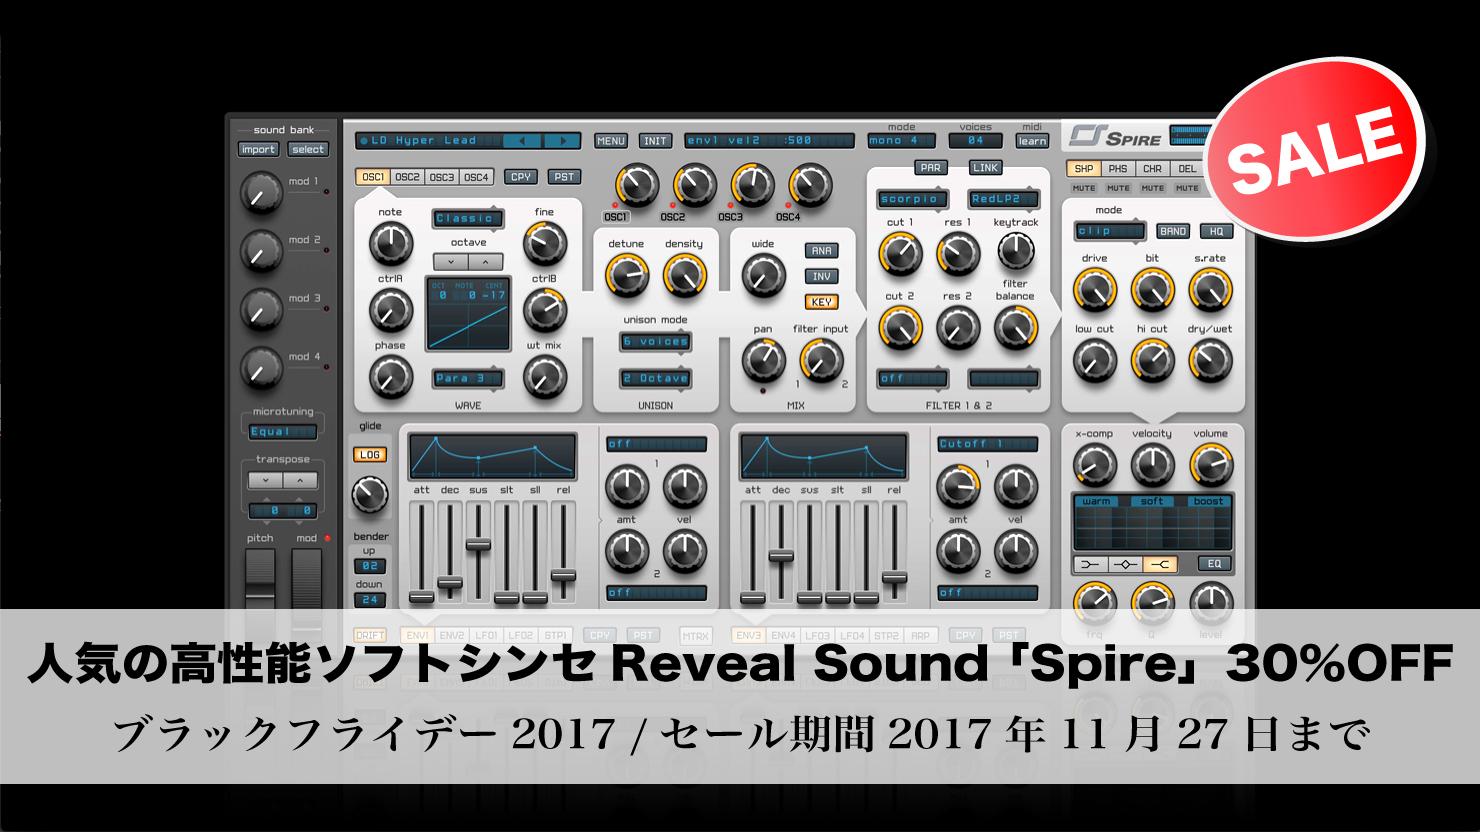 【30%OFF】人気の高性能ソフトシンセ Reveal Sound Spire ブラックフライデー2017